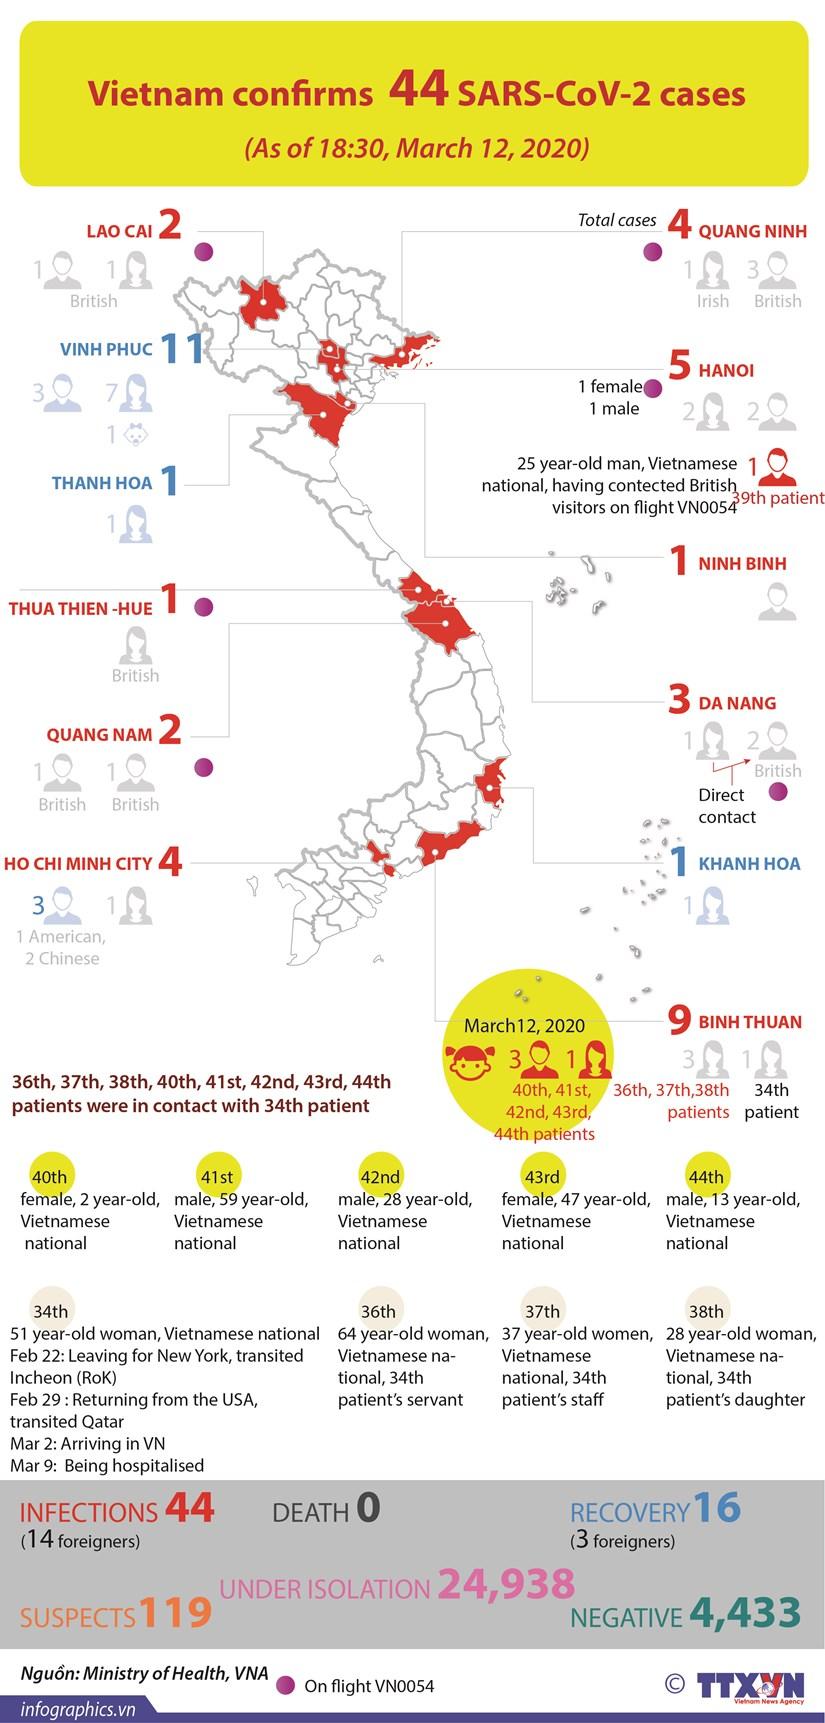 Vietnam confirms 44 SARS-CoV-2 cases hinh anh 1